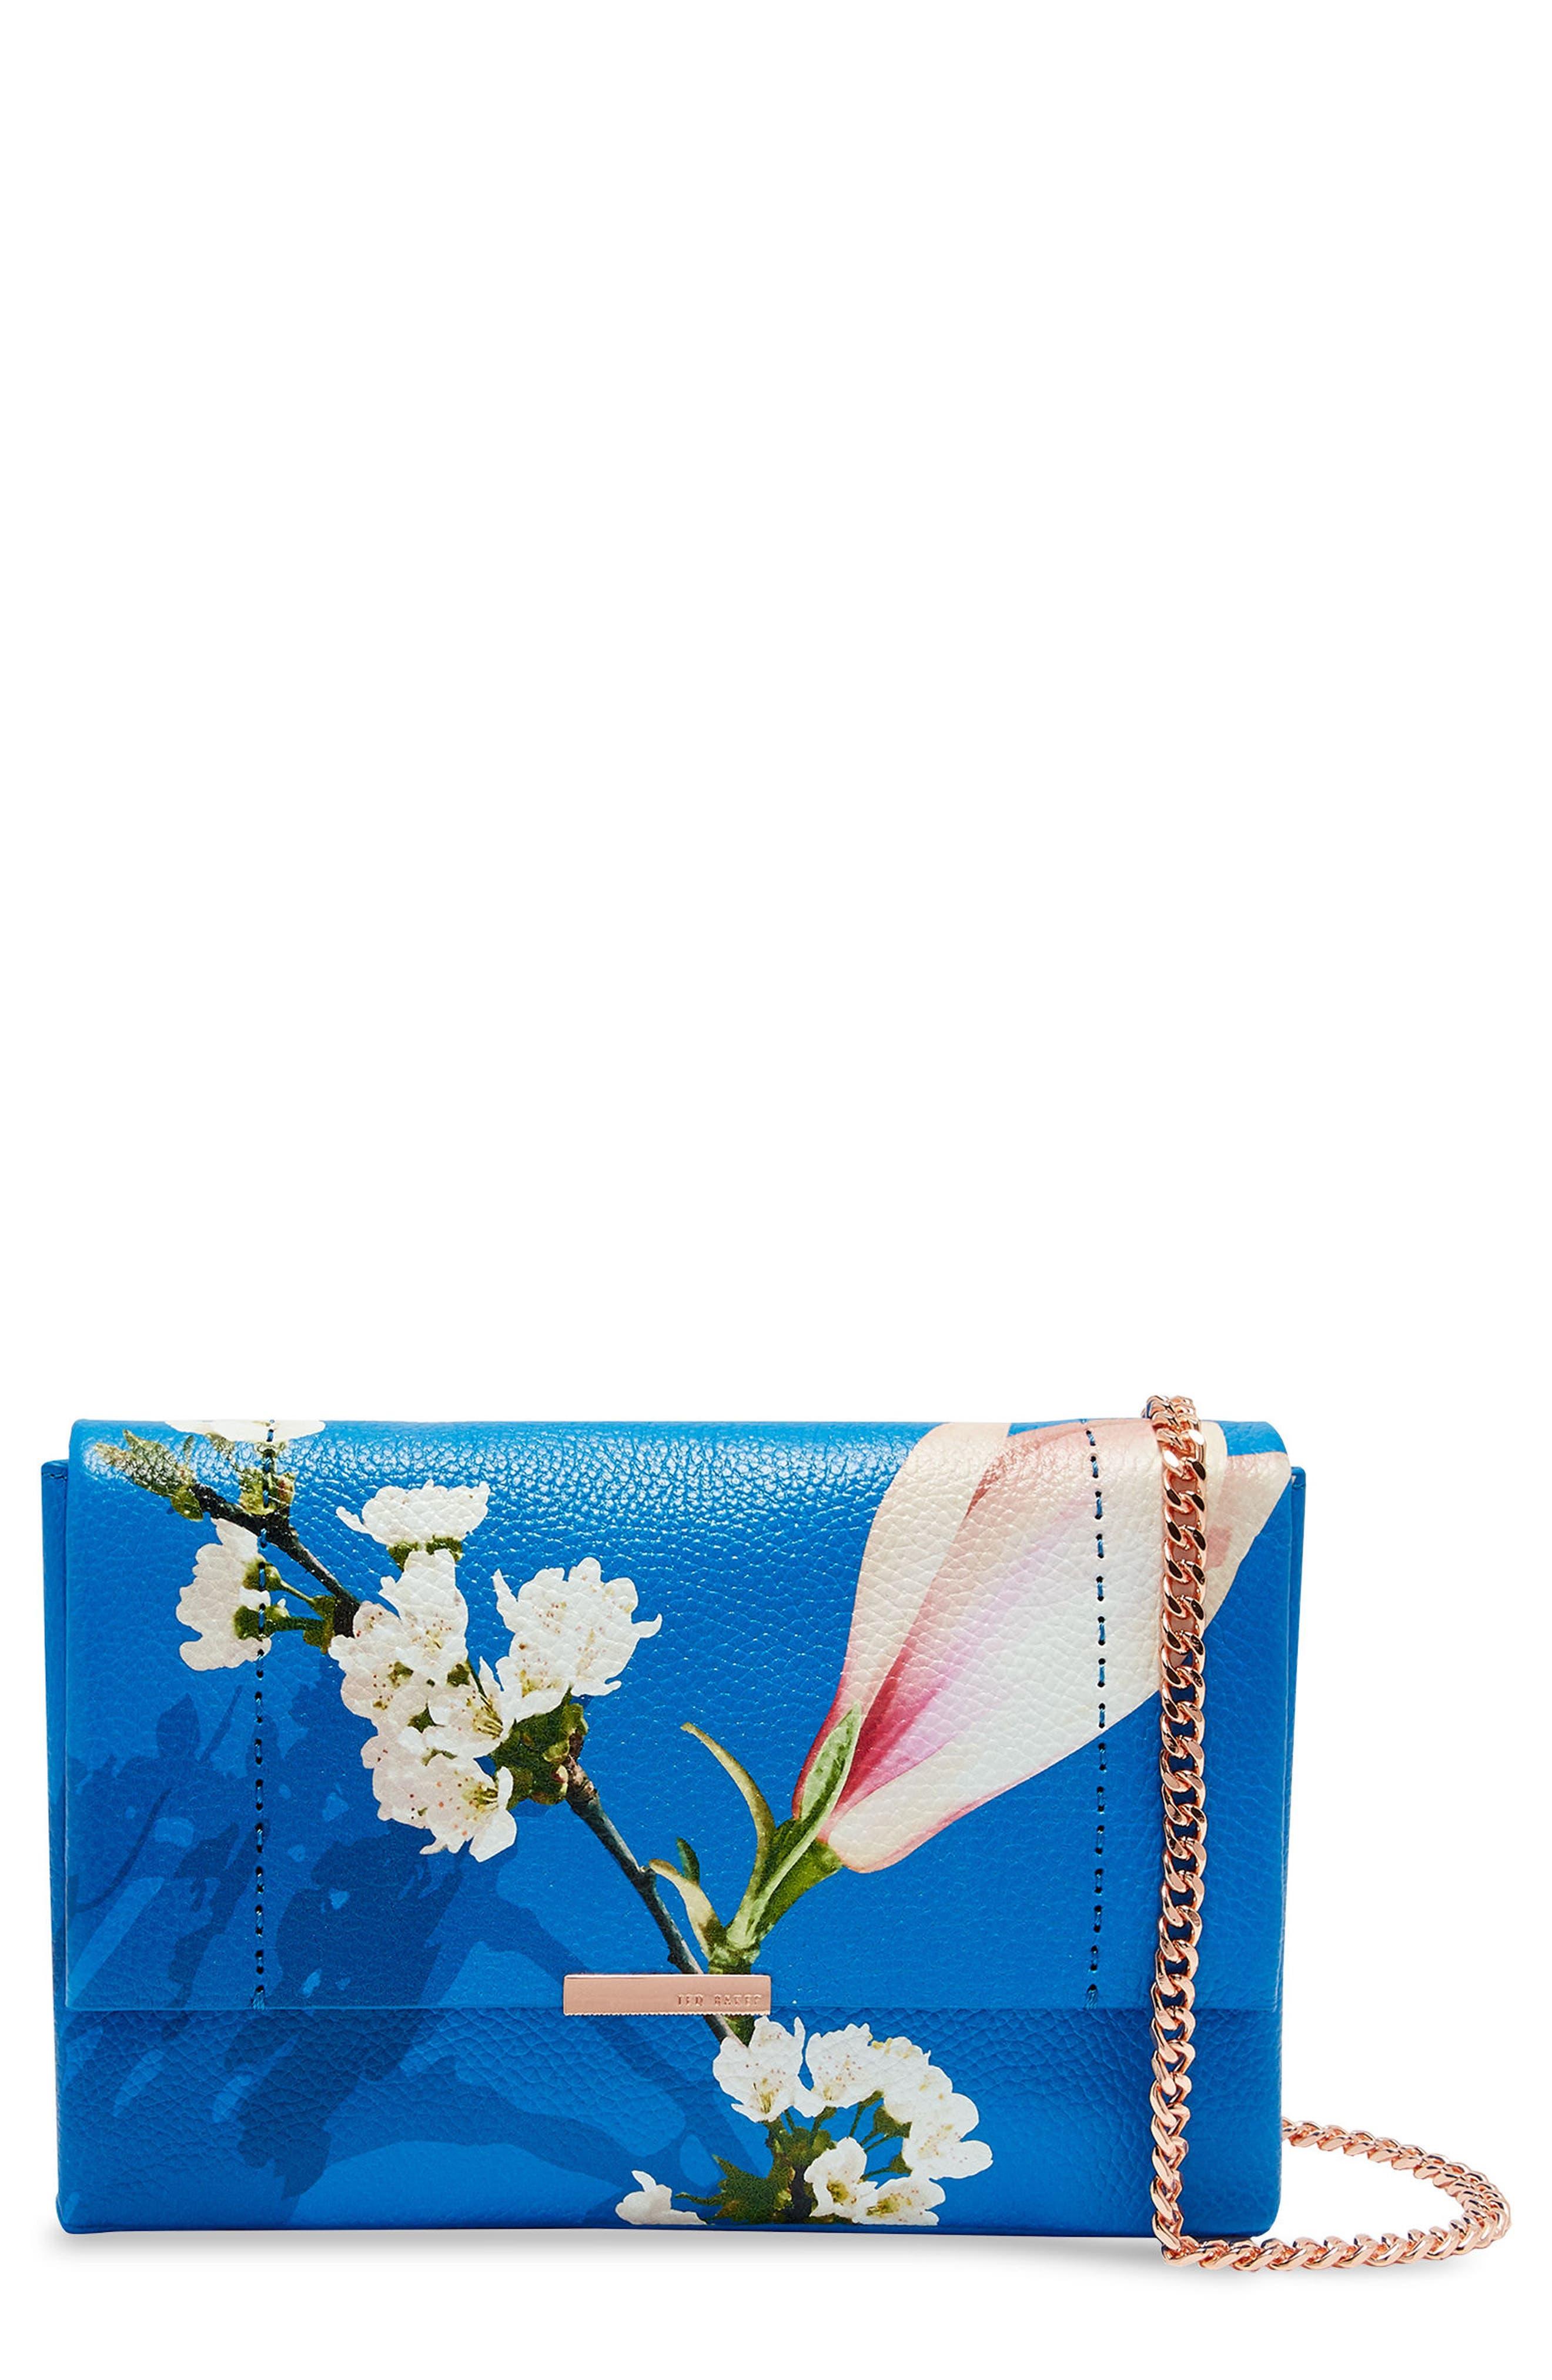 Haalle Harmony Leather Crossbody Bag,                             Main thumbnail 1, color,                             Bright Blue